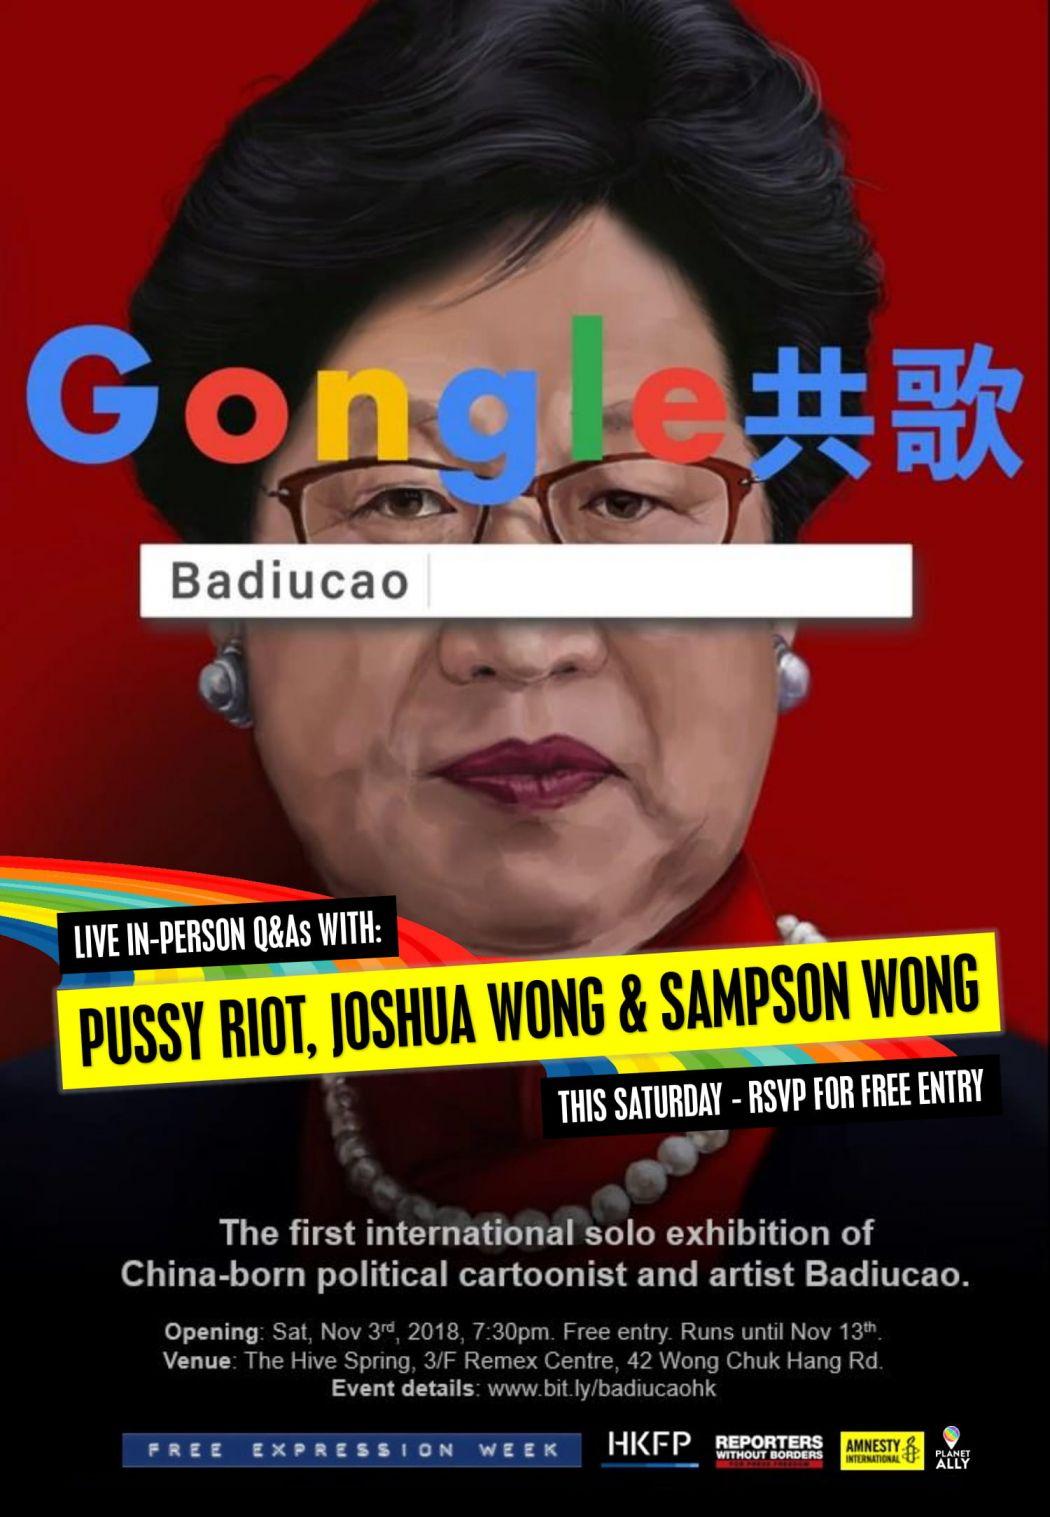 badiucao pussy riot joshua wong